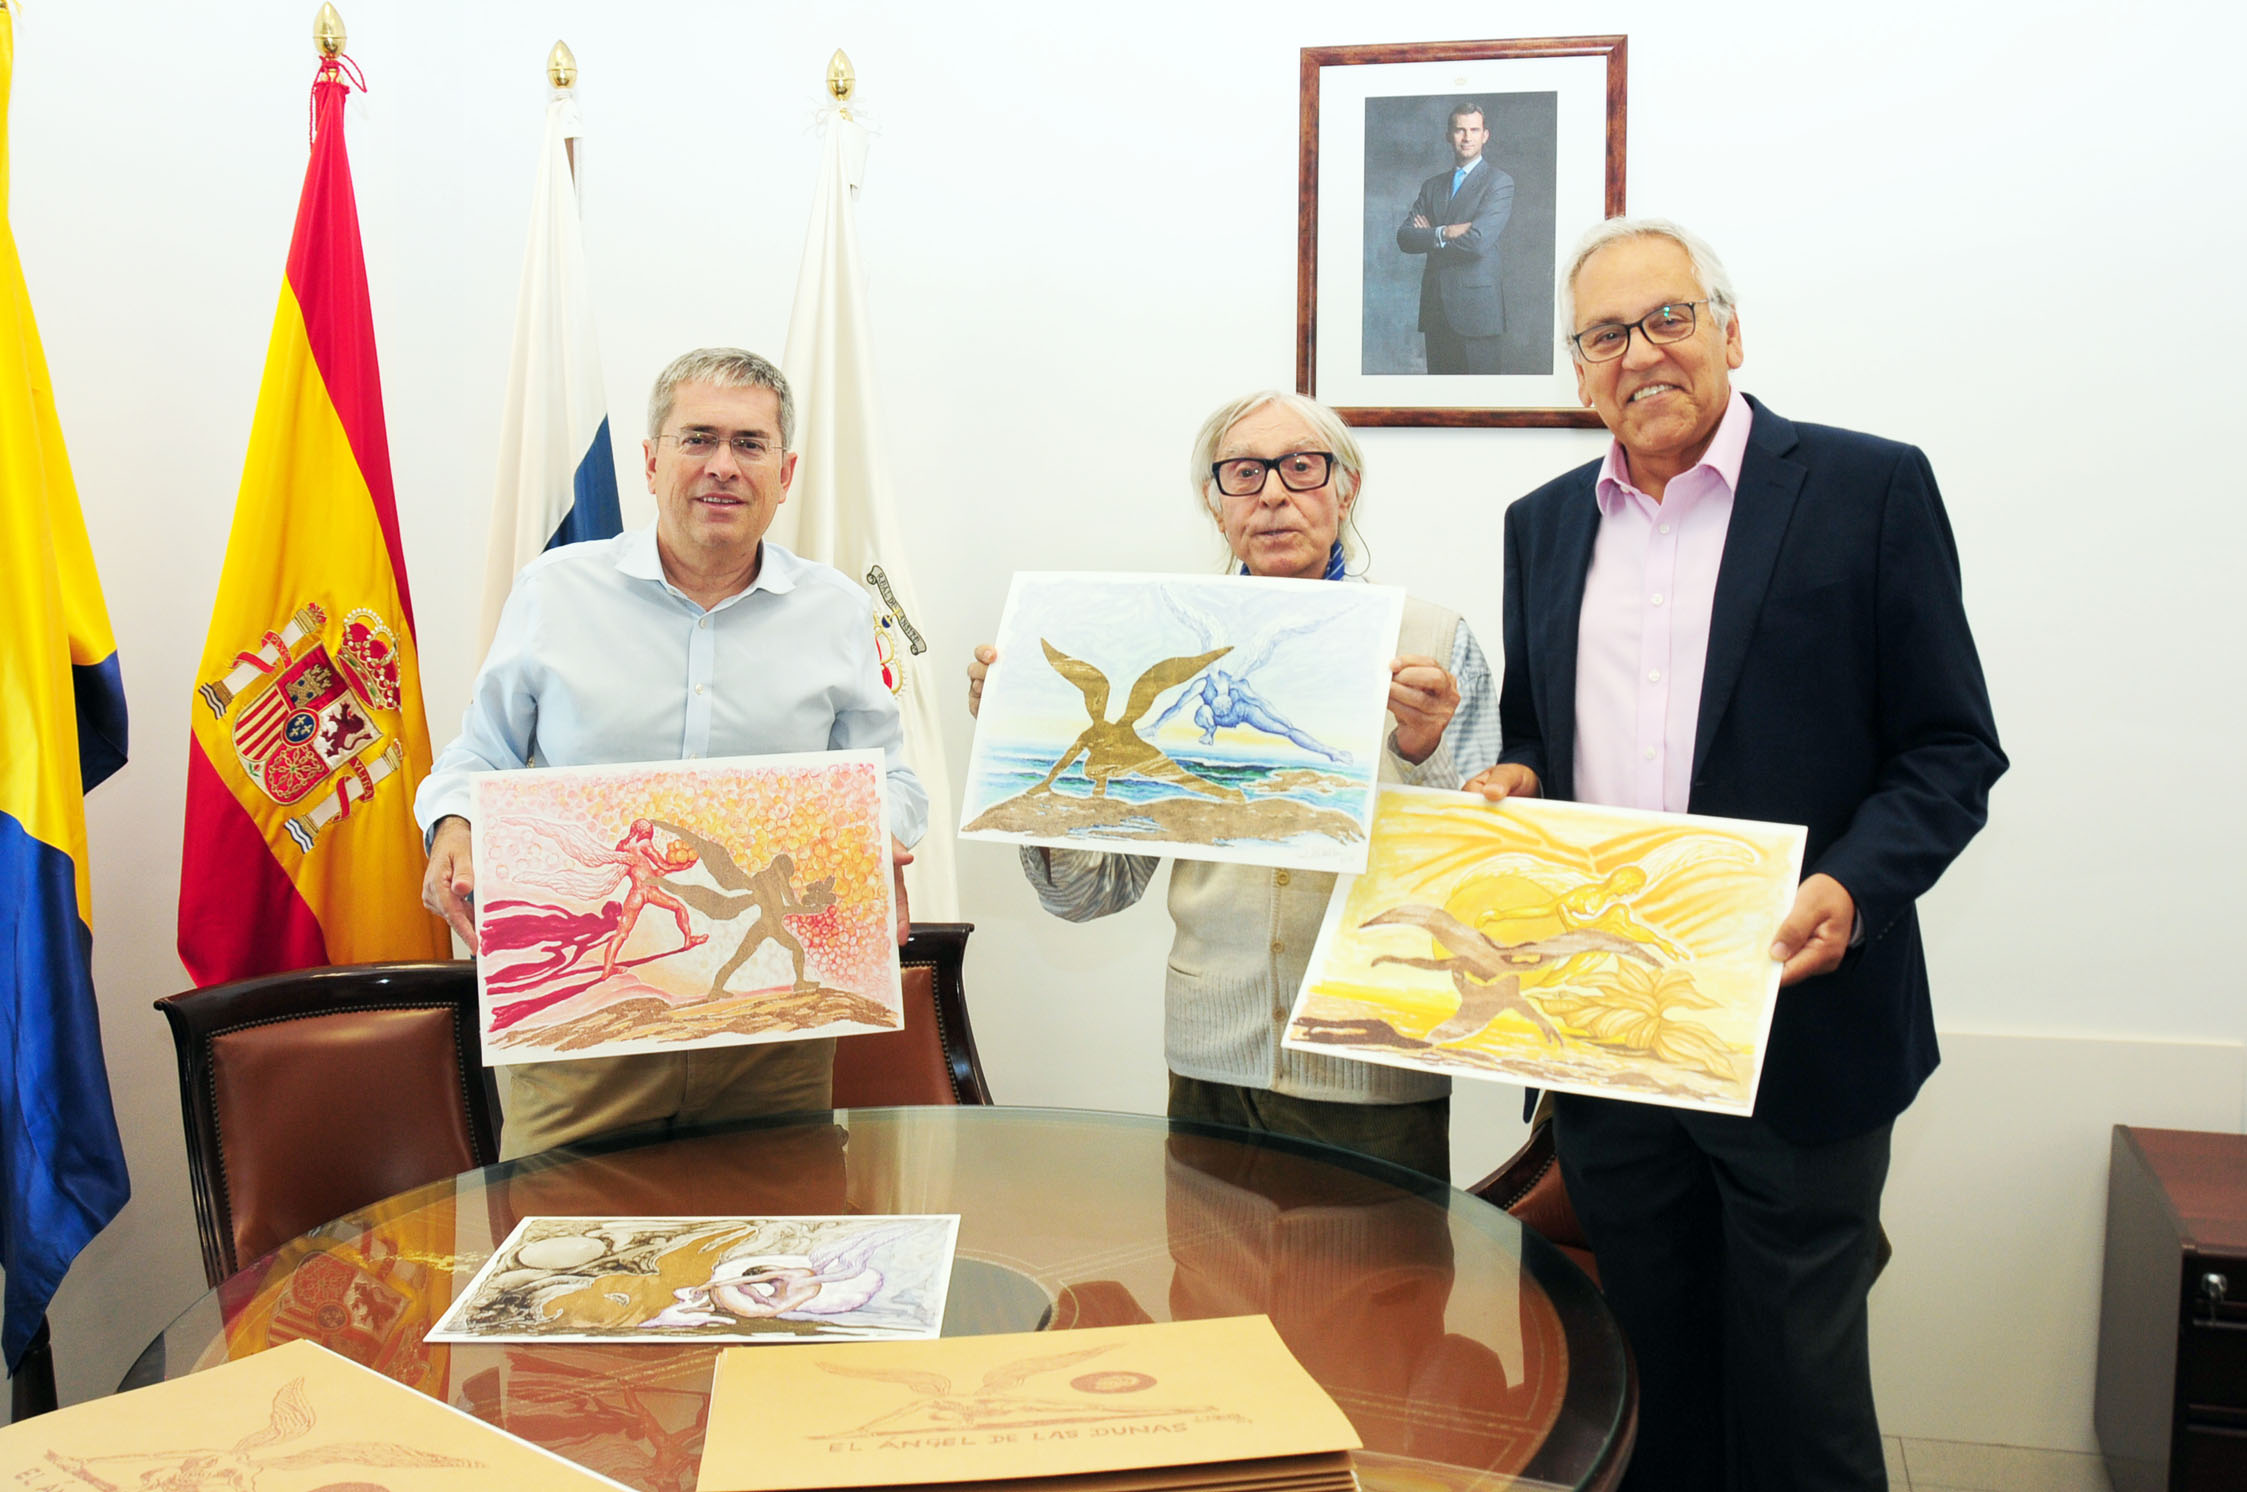 San Bartolomé de Tirajana adquiere mil láminas de 'El Ángel de las Dunas' de Pepe Dámaso